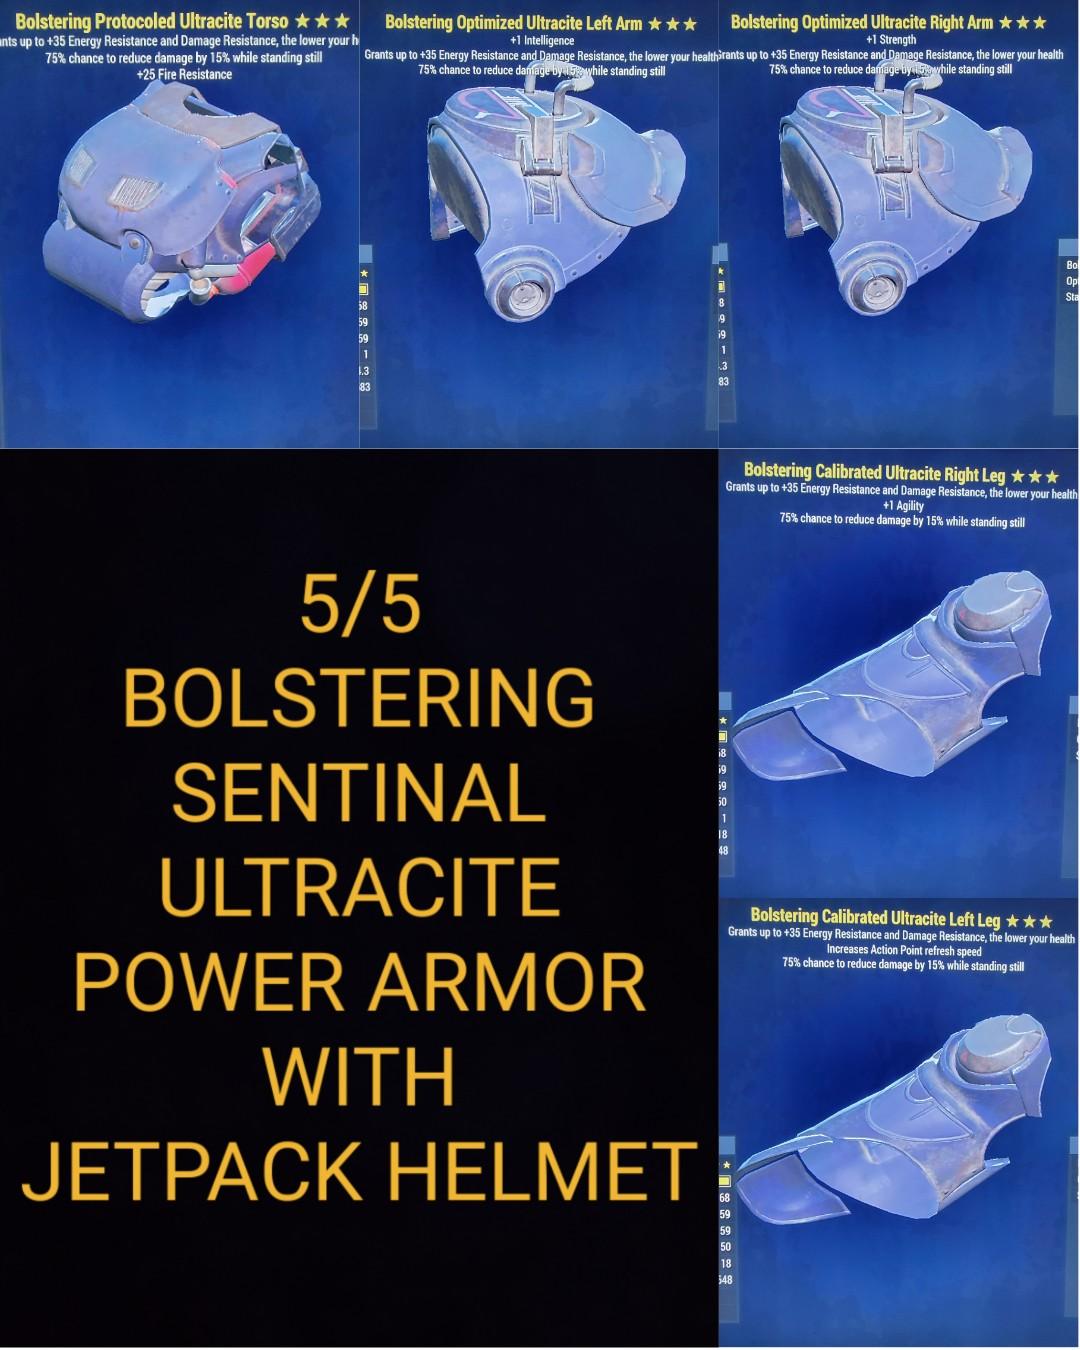 Bolstering Sentinal Ultracite Power Armor Set With Jetpack Helmet